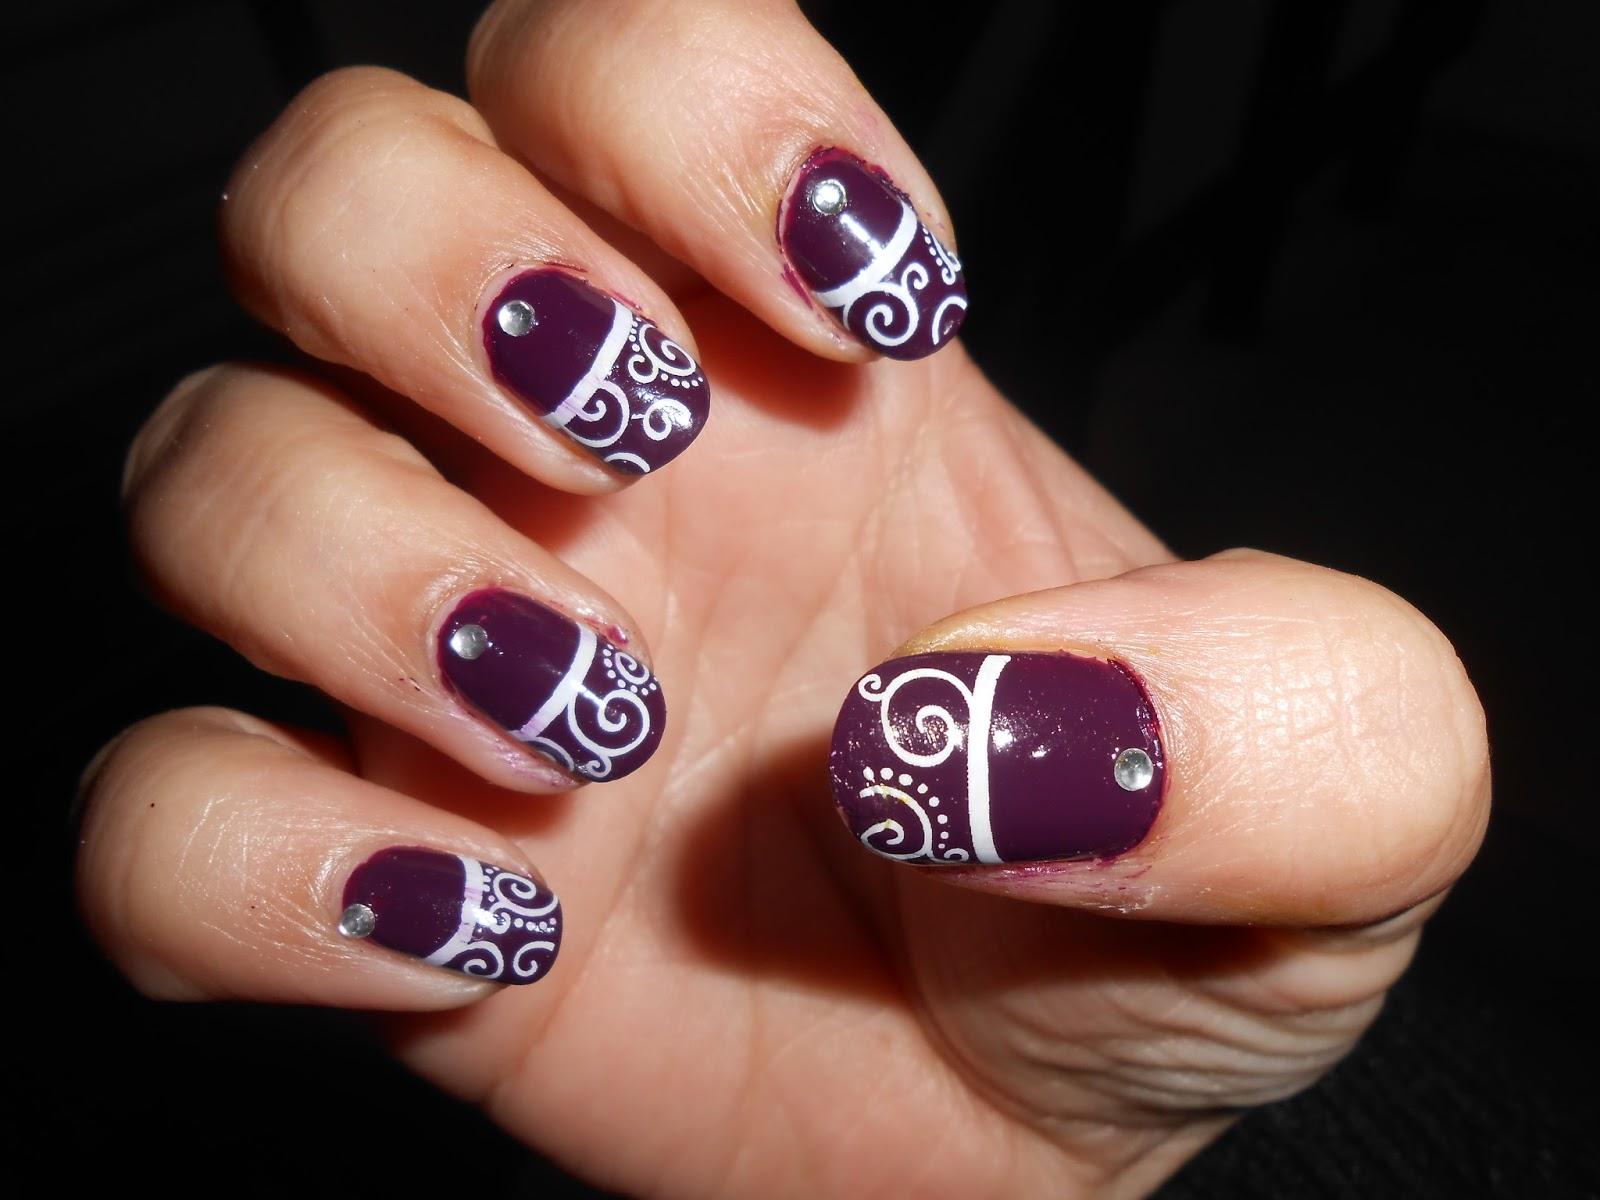 Nails French Design Swirls